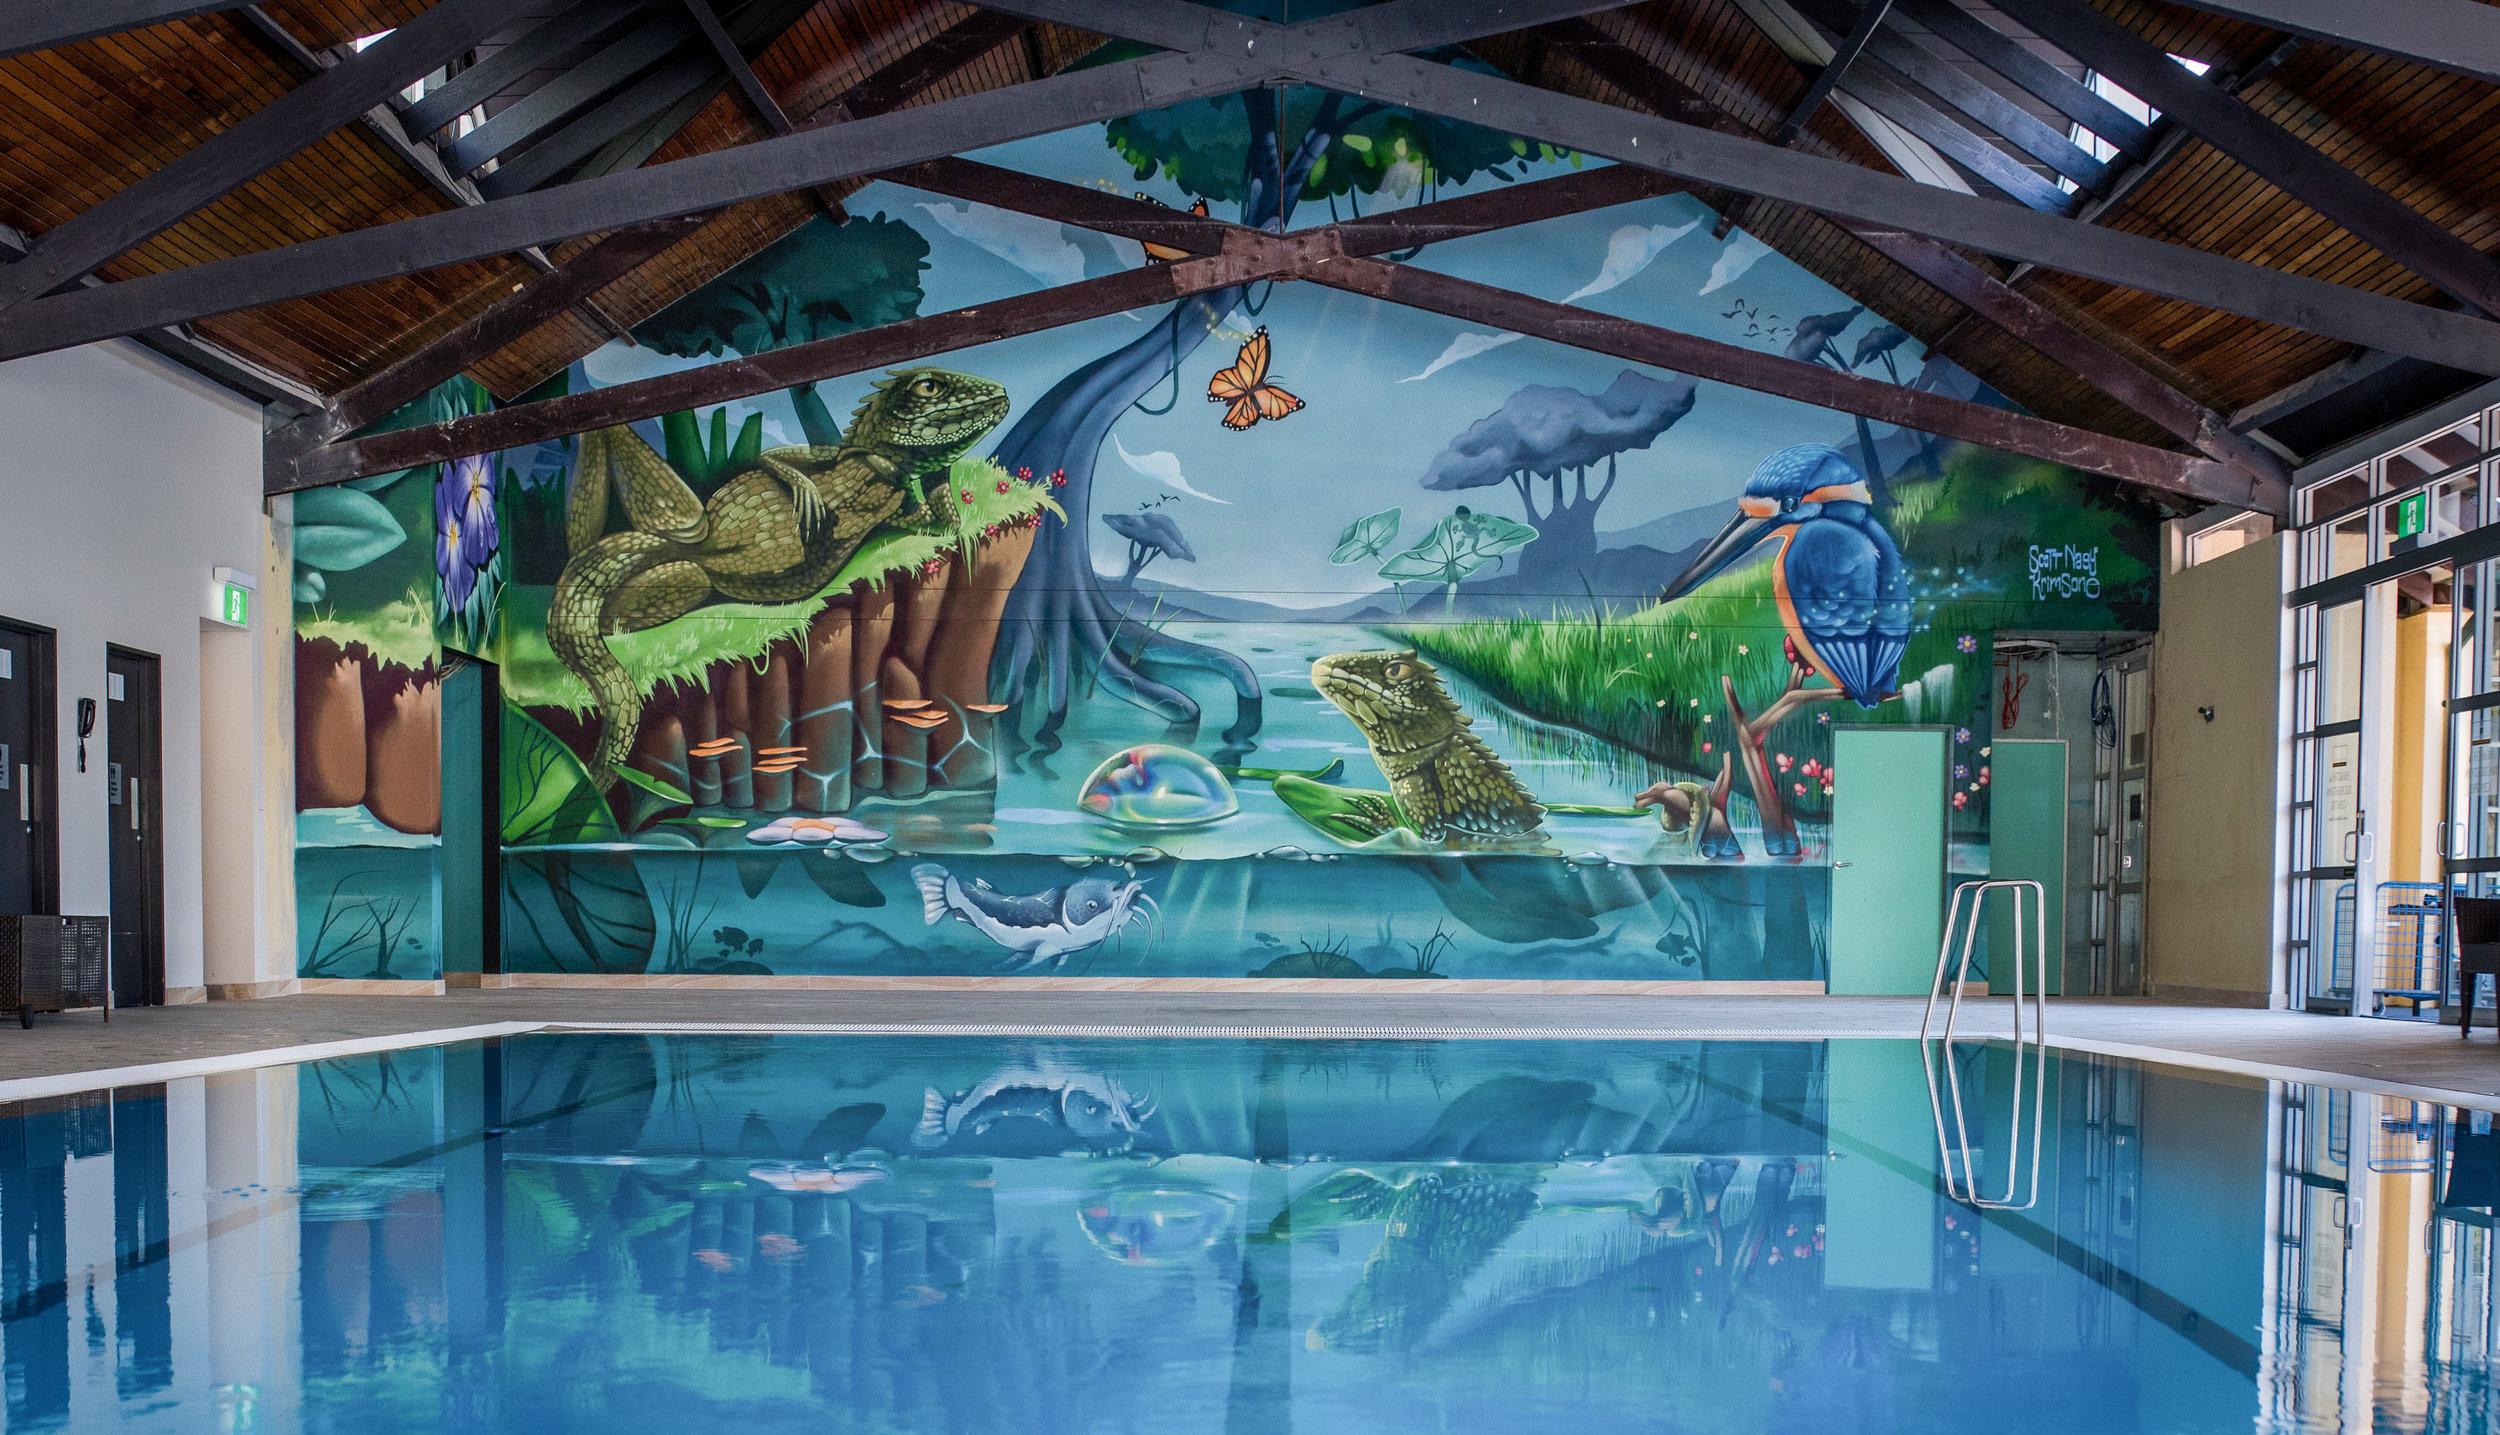 Fairmont Indoor Pool